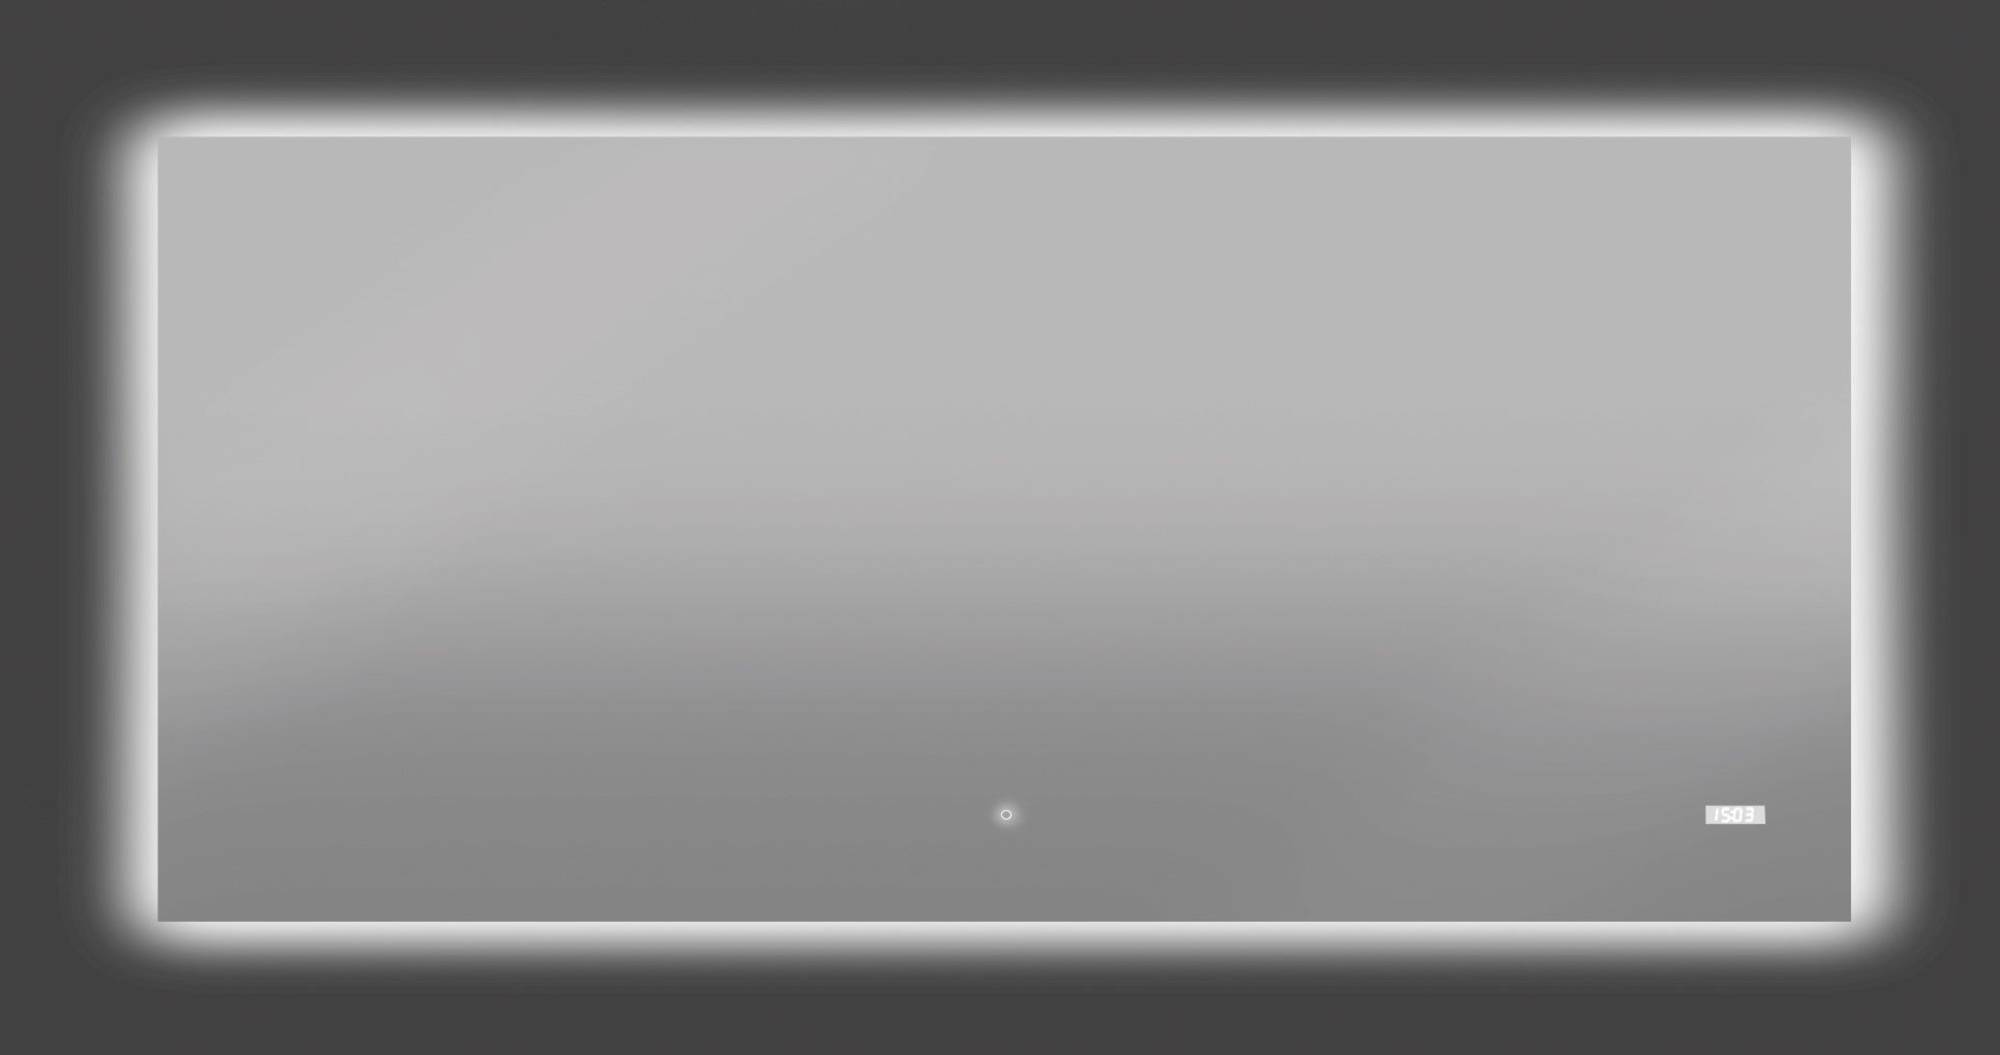 Thebalux Time LED spiegel 140x70x3,5 cm Alu frame